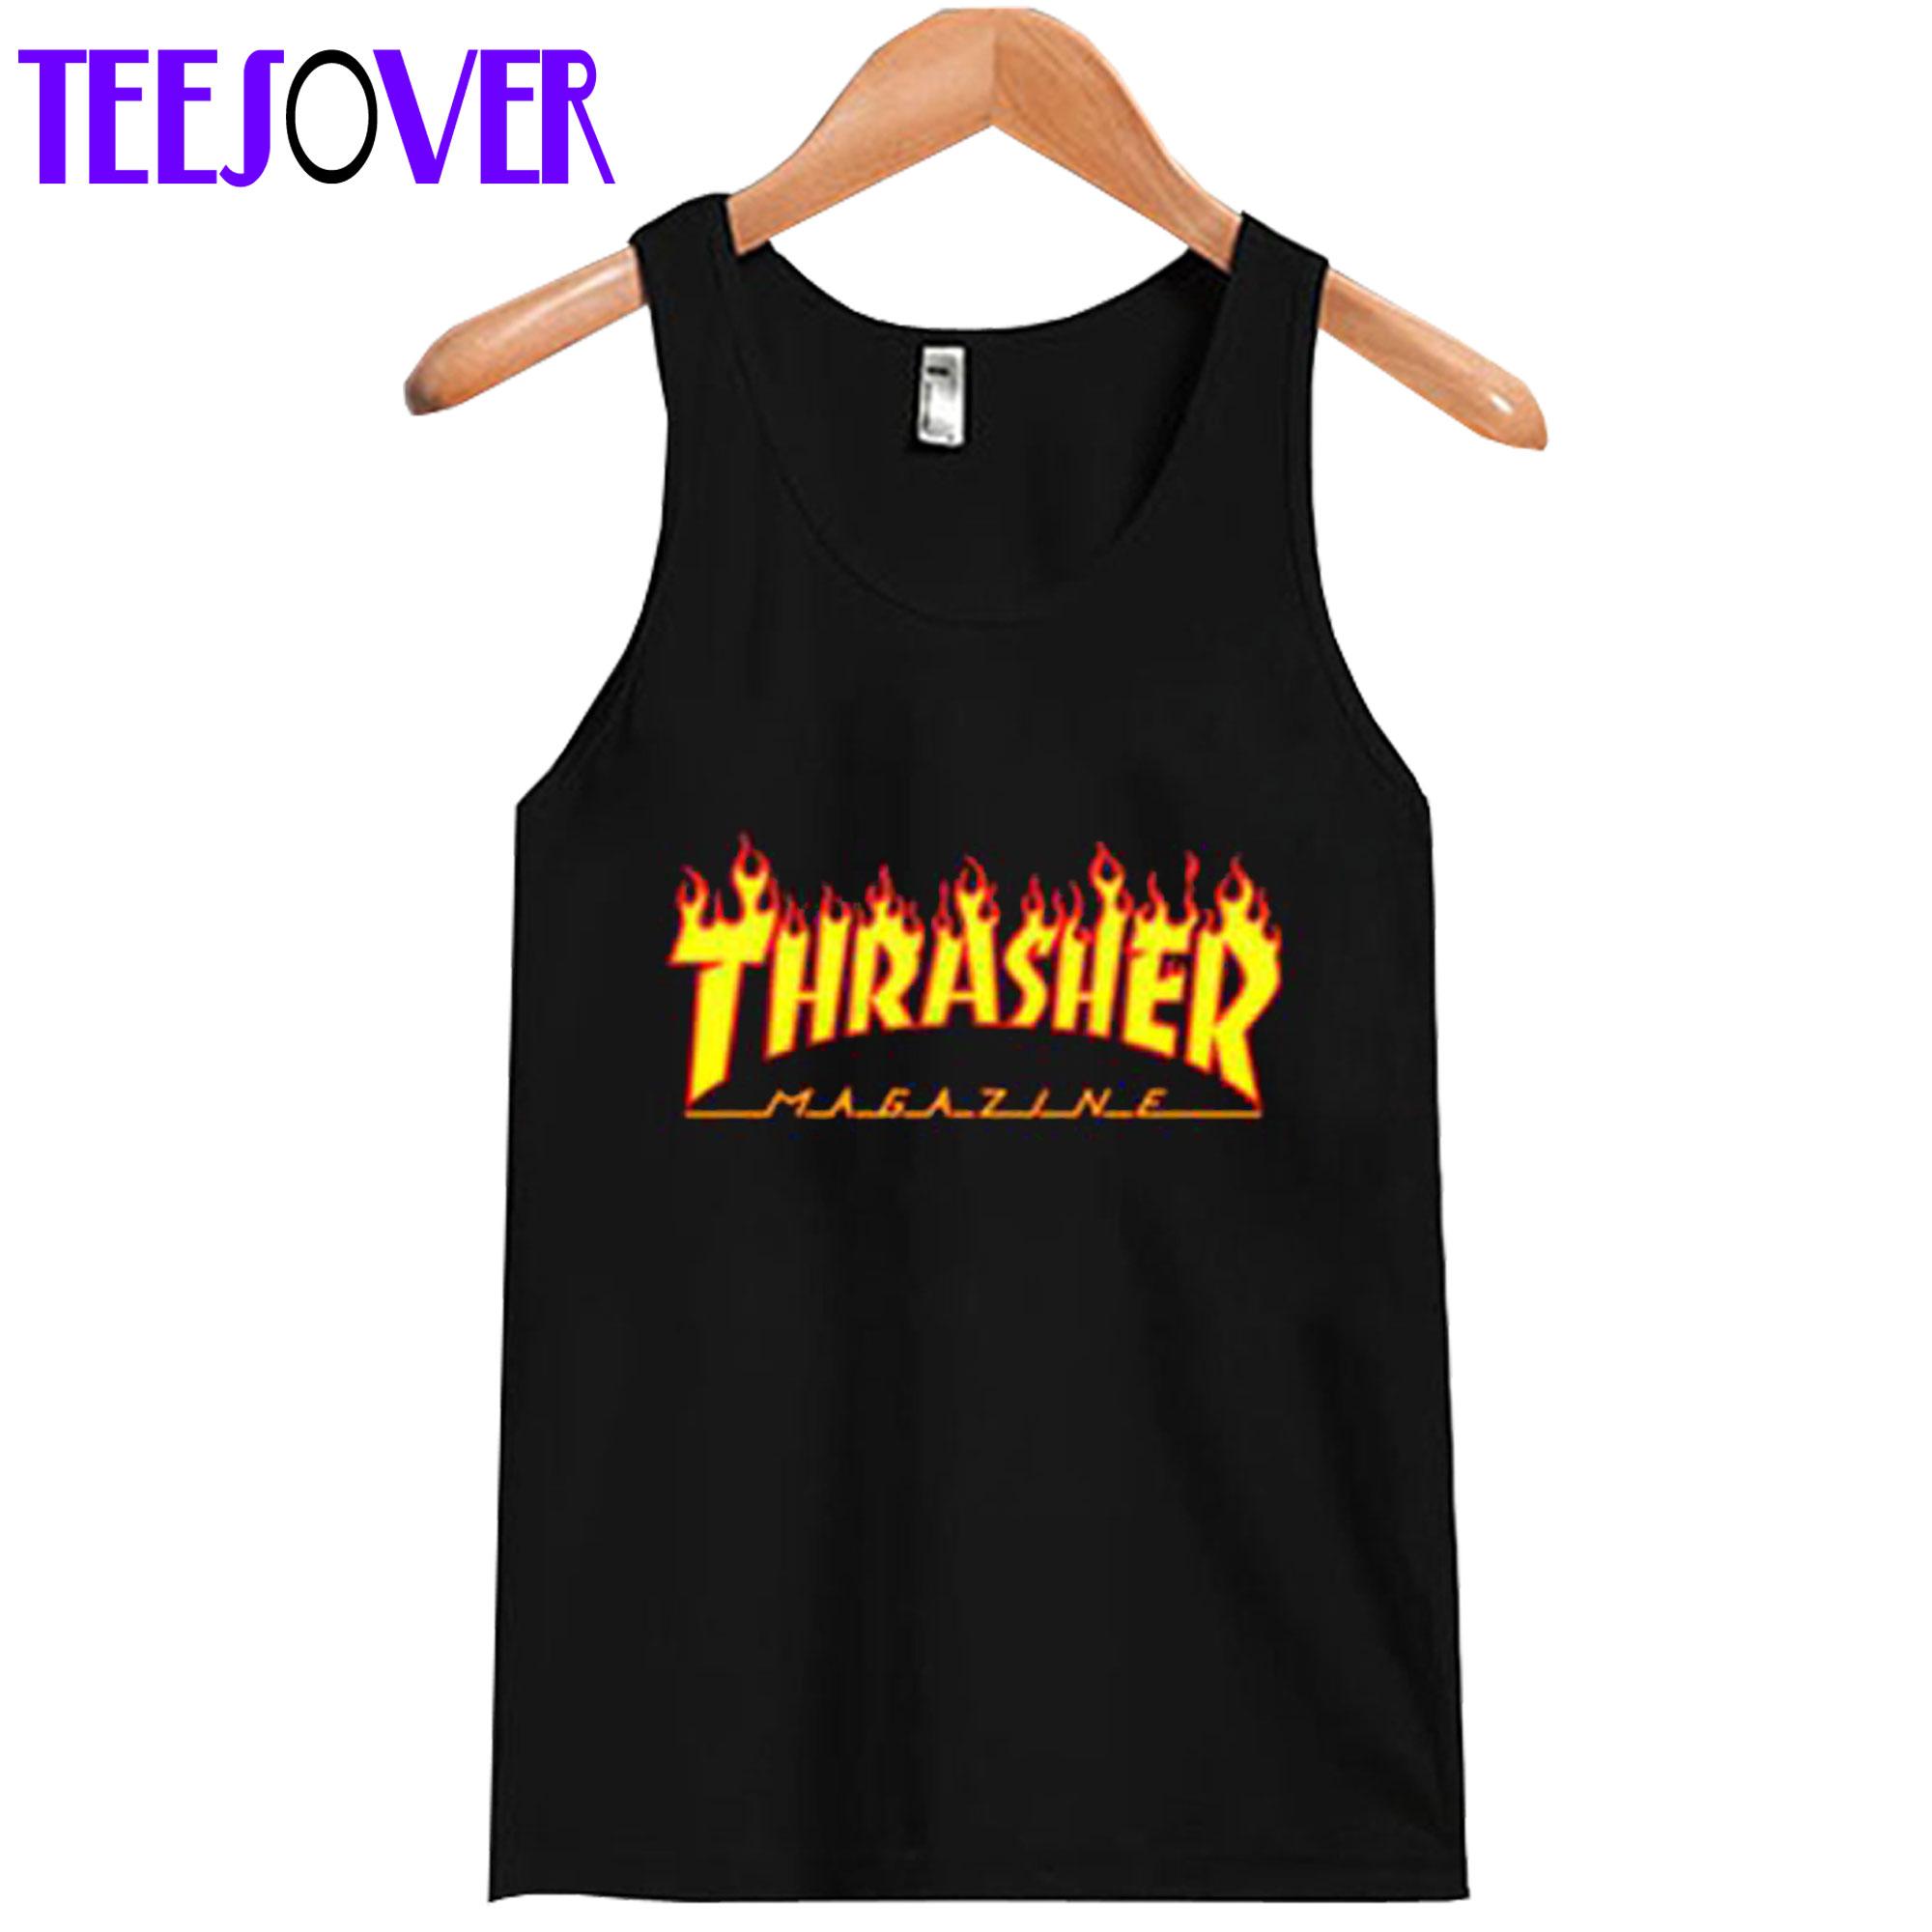 Thrasher Magazine Tanktop